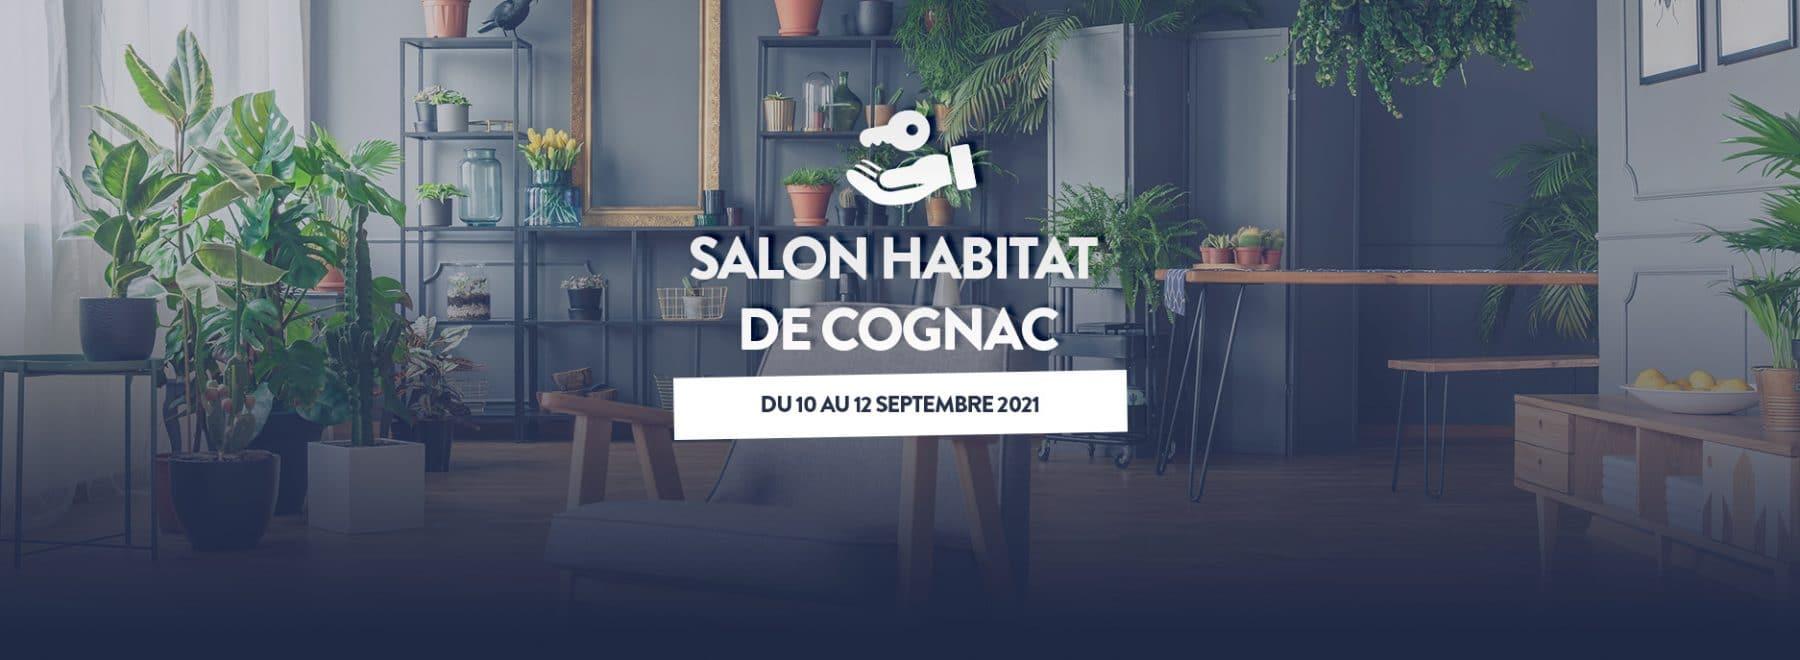 salon habitat cognac